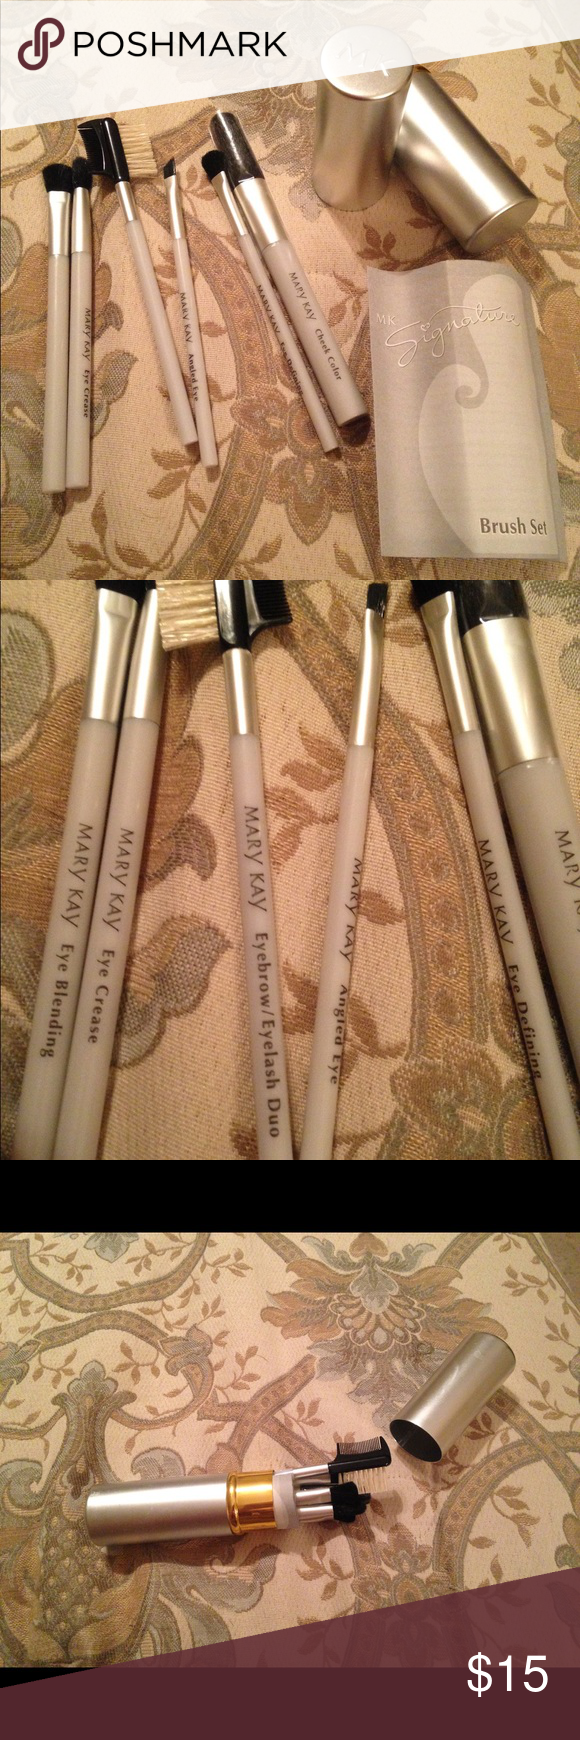 Mary kay signature makeup brush set new final nwt